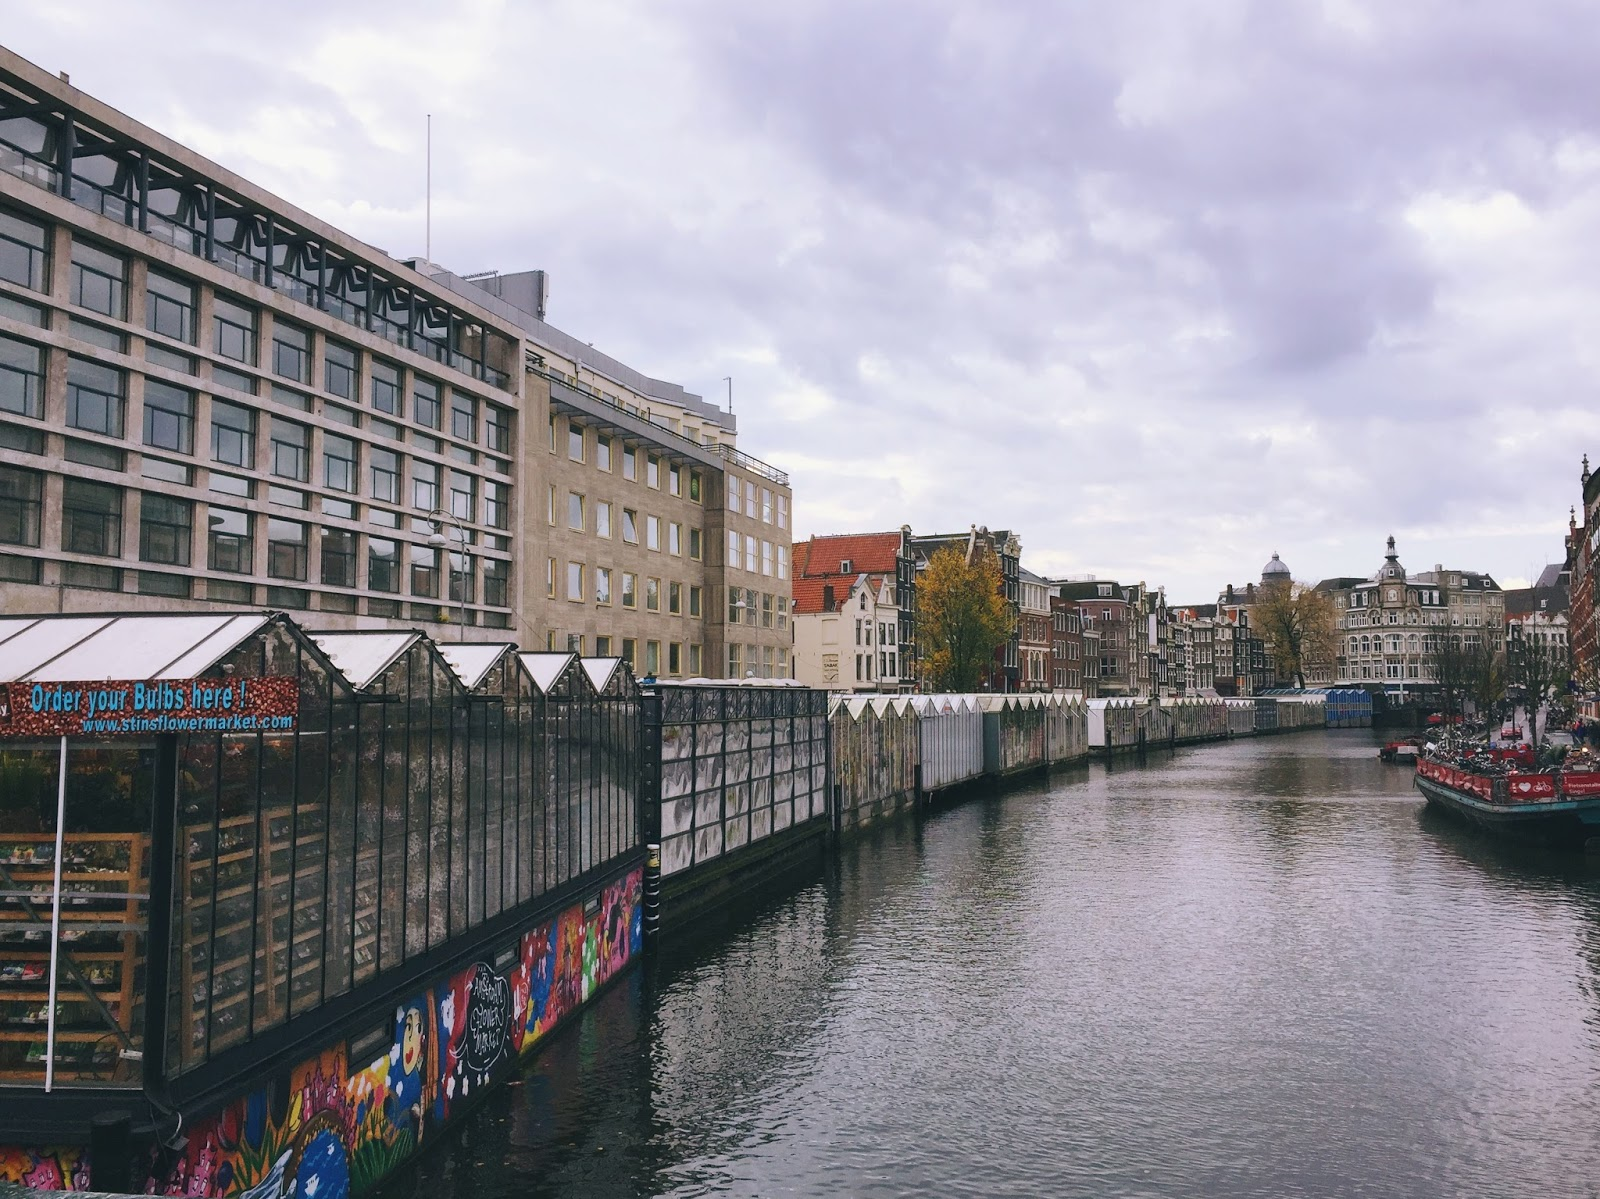 Bloemenmarkt - The floating flower market